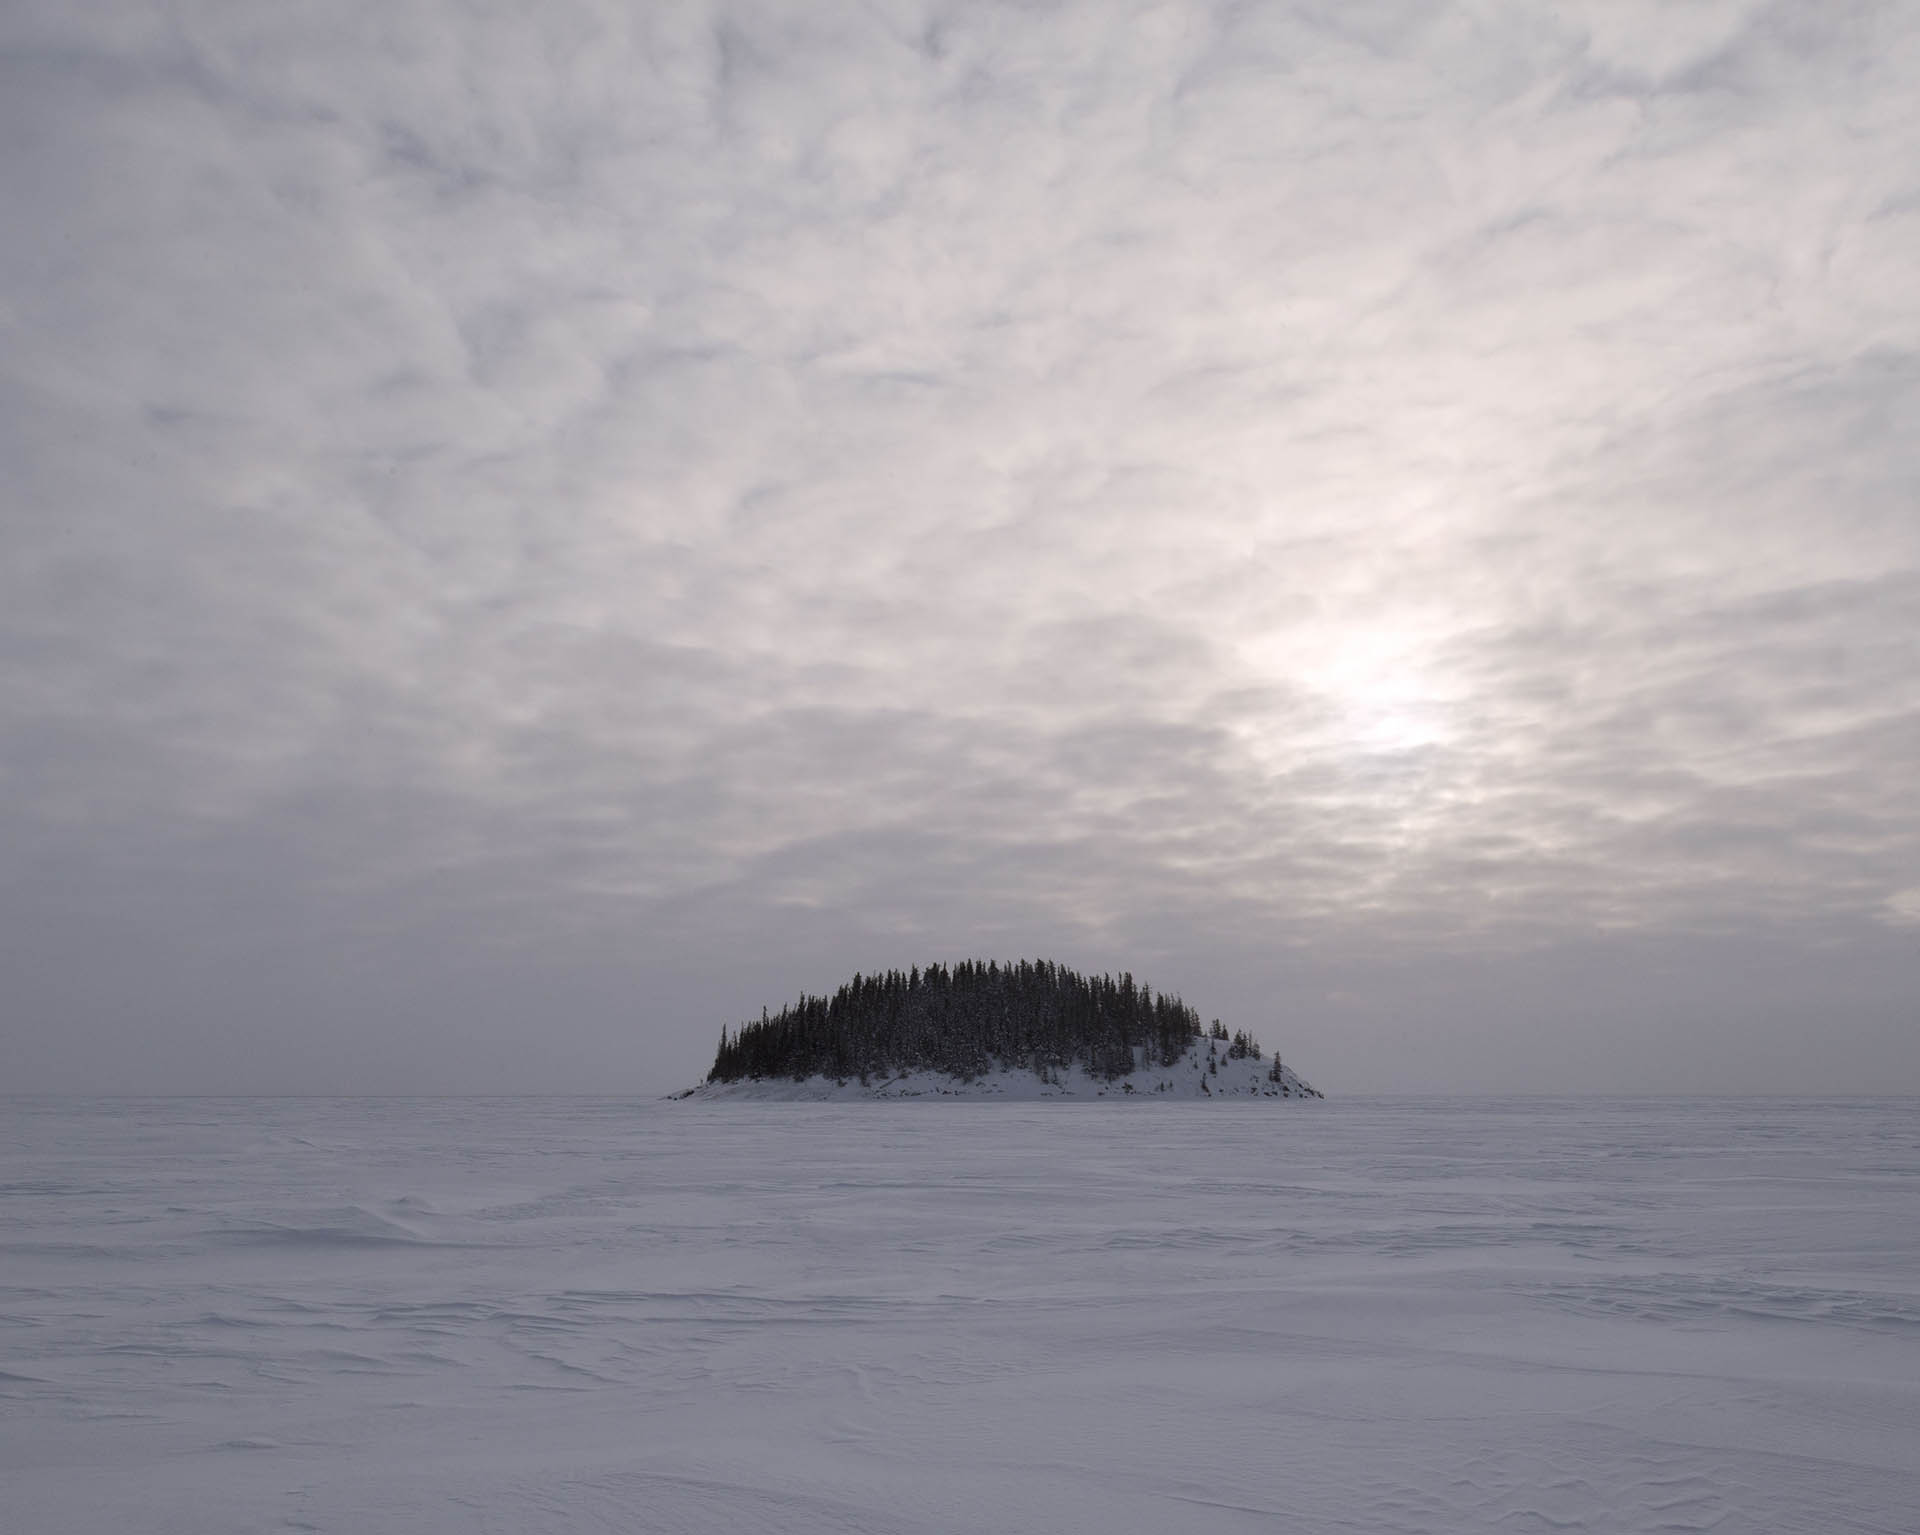 Mother Nature, Alberta, Canada January 2018, bituminous sand © Samuel Bollendorff